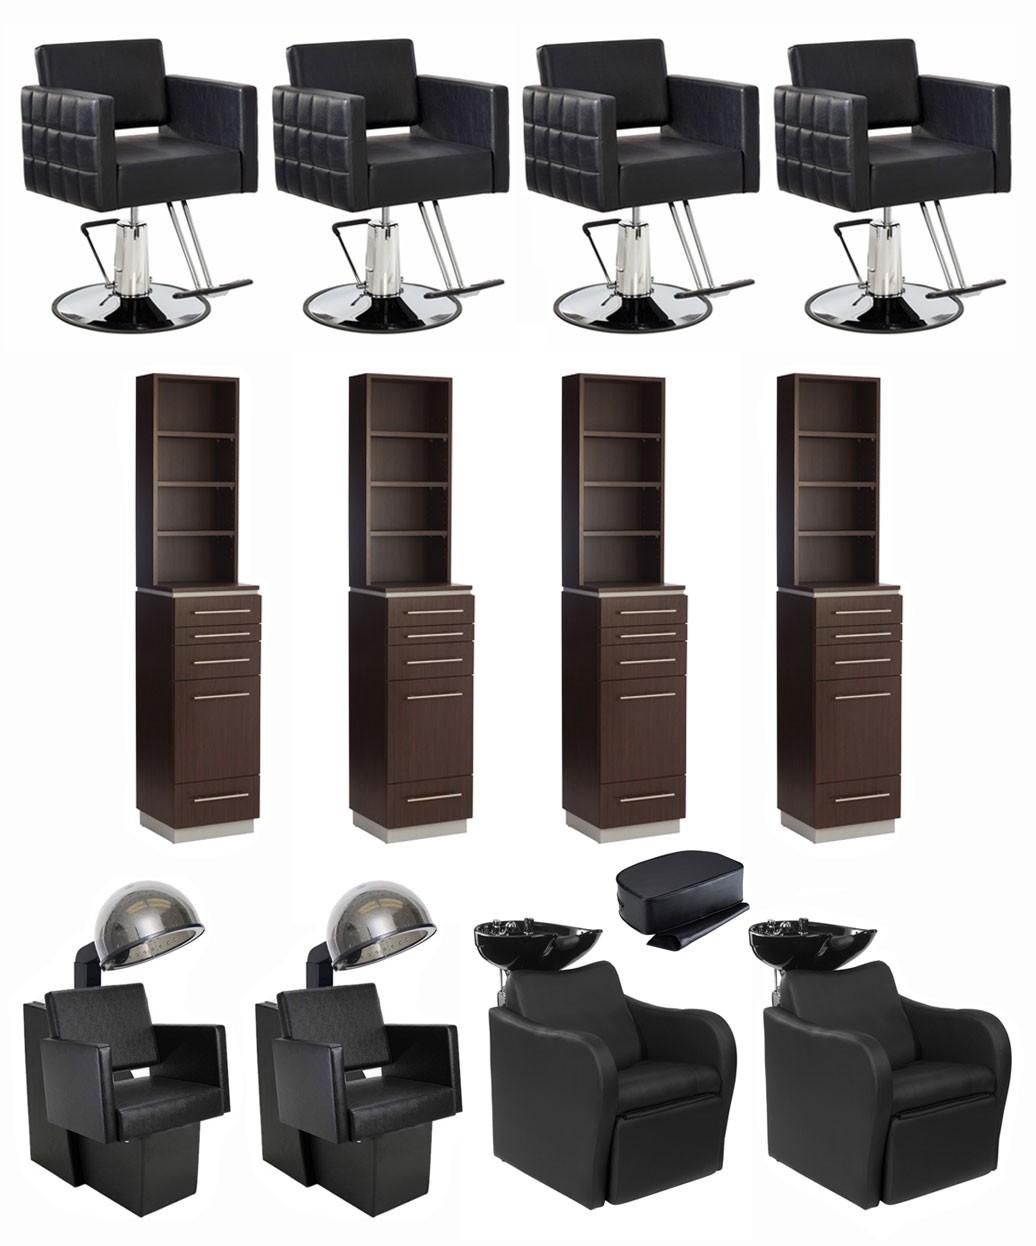 4 Operator Icon & Bali Tower w/ Retail Salon Package